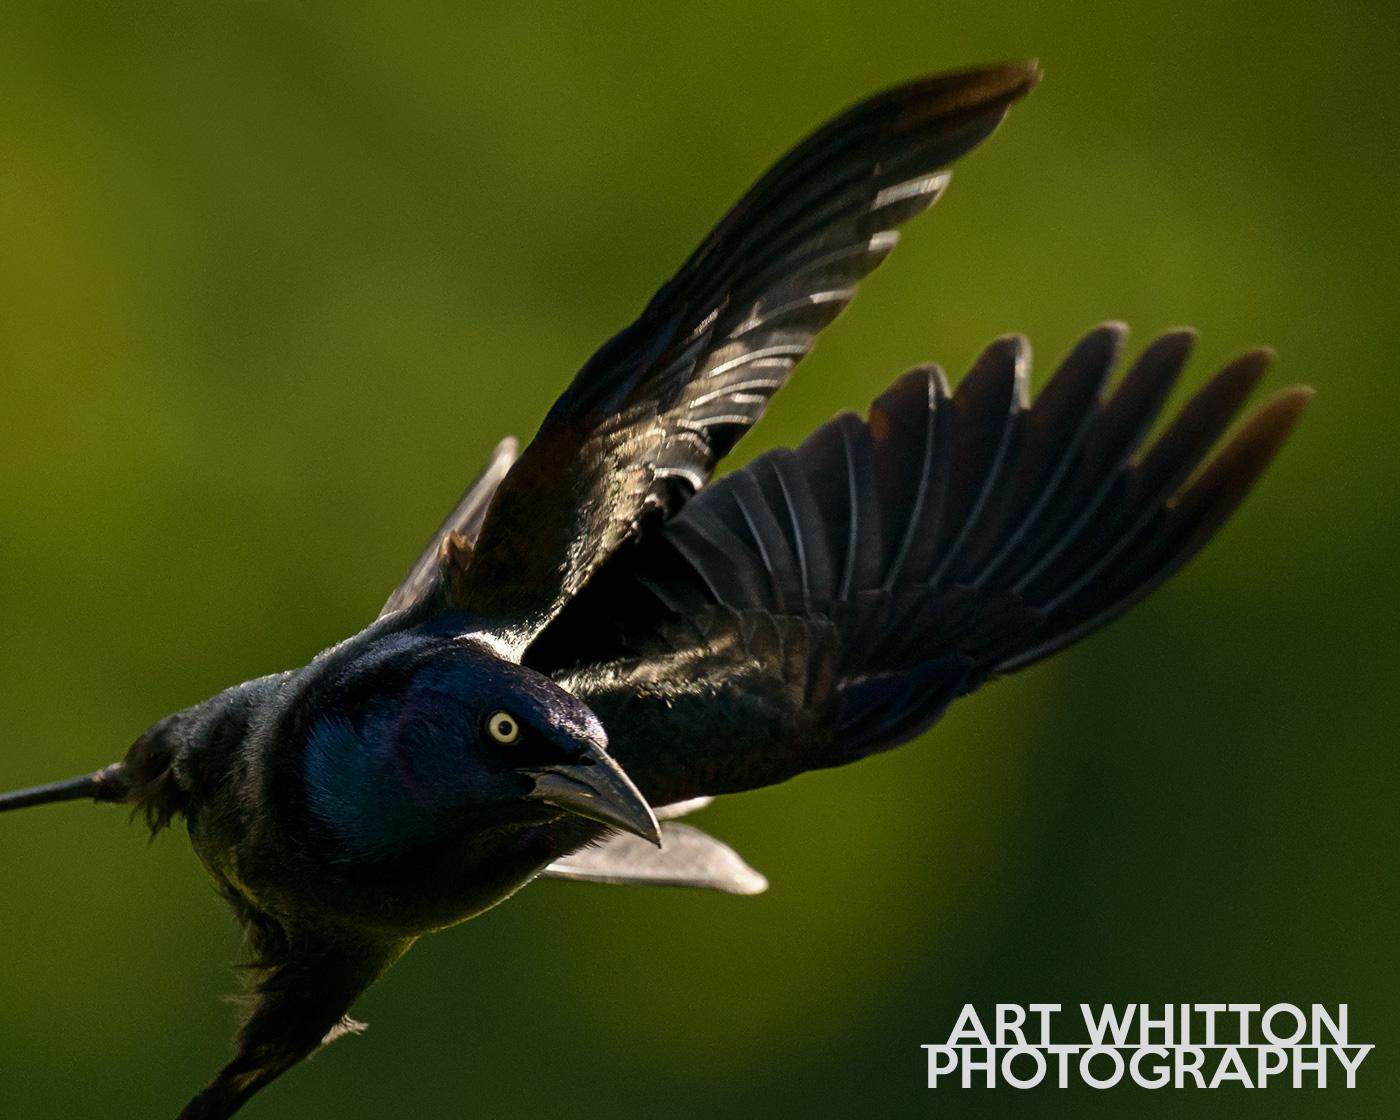 gallery of birds art whitton photography